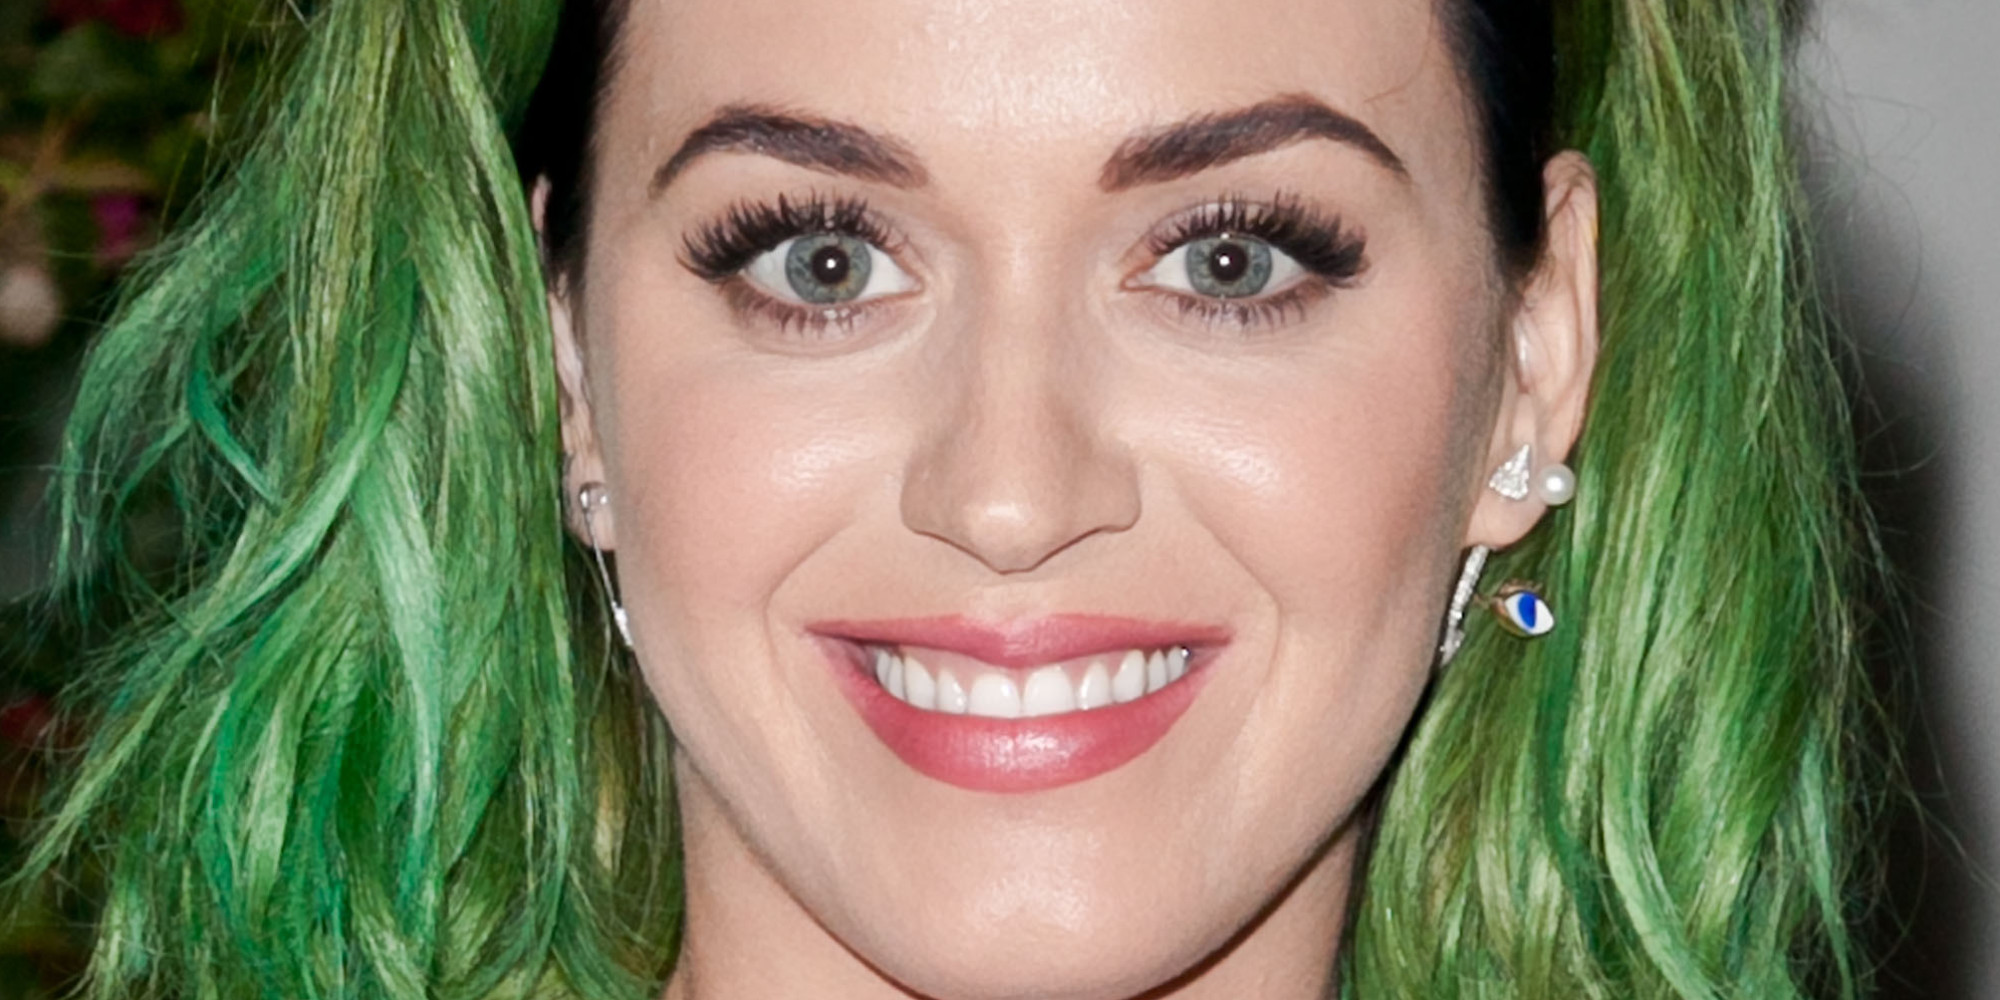 Celebs Take Bold Risks On This Week's Best & Worst Beauty List: www.huffingtonpost.com/2014/04/13/celebrity-beauty-risks-best-worst...